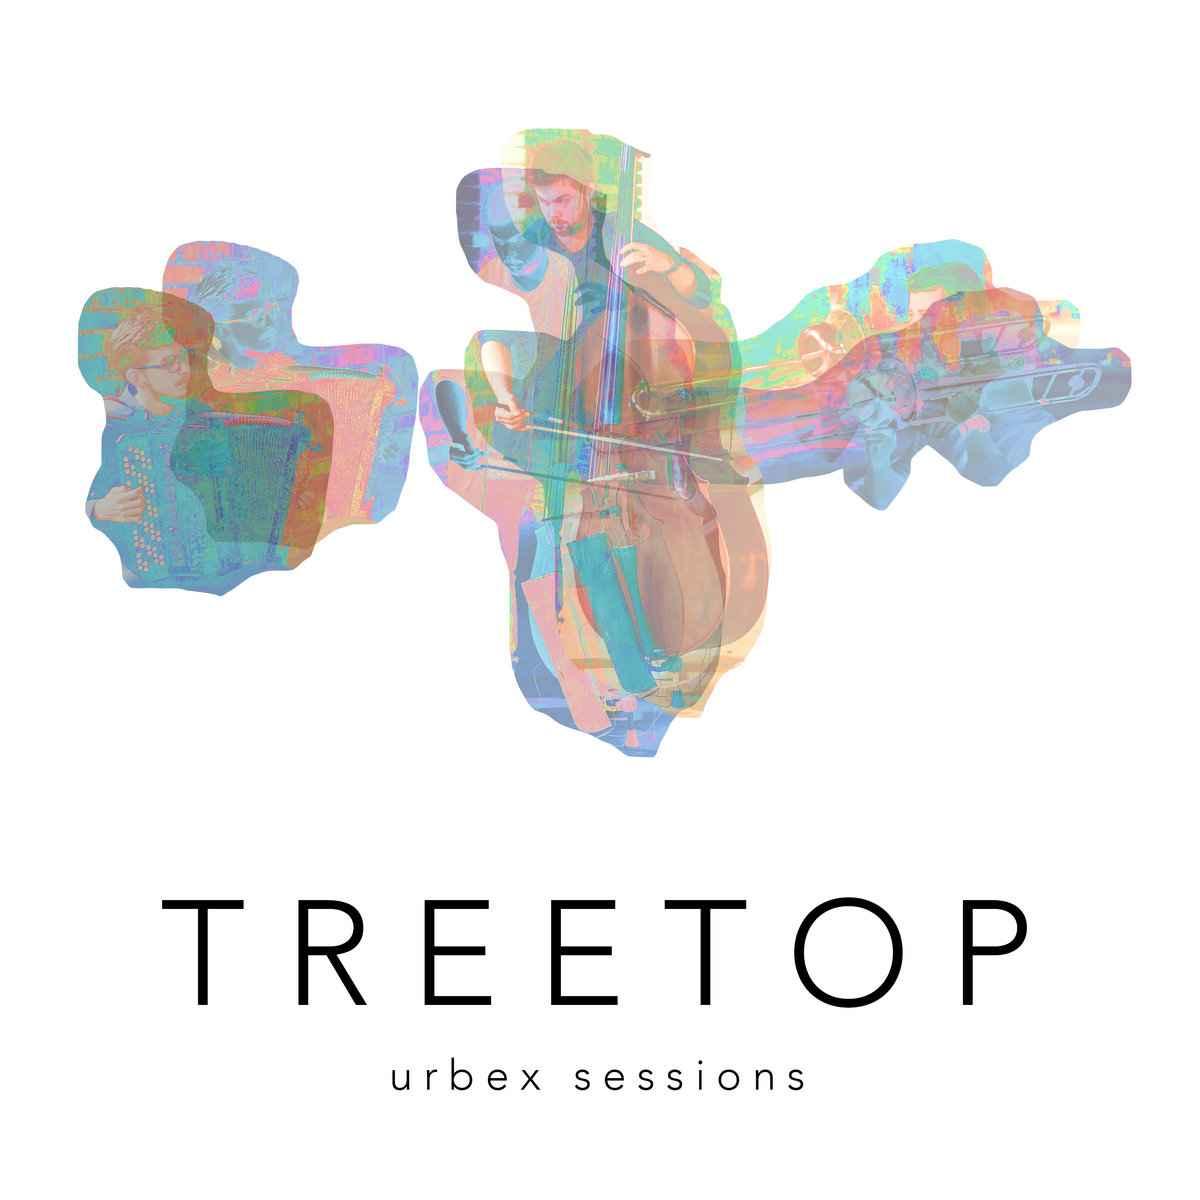 TREETOP: Urbex Sessions